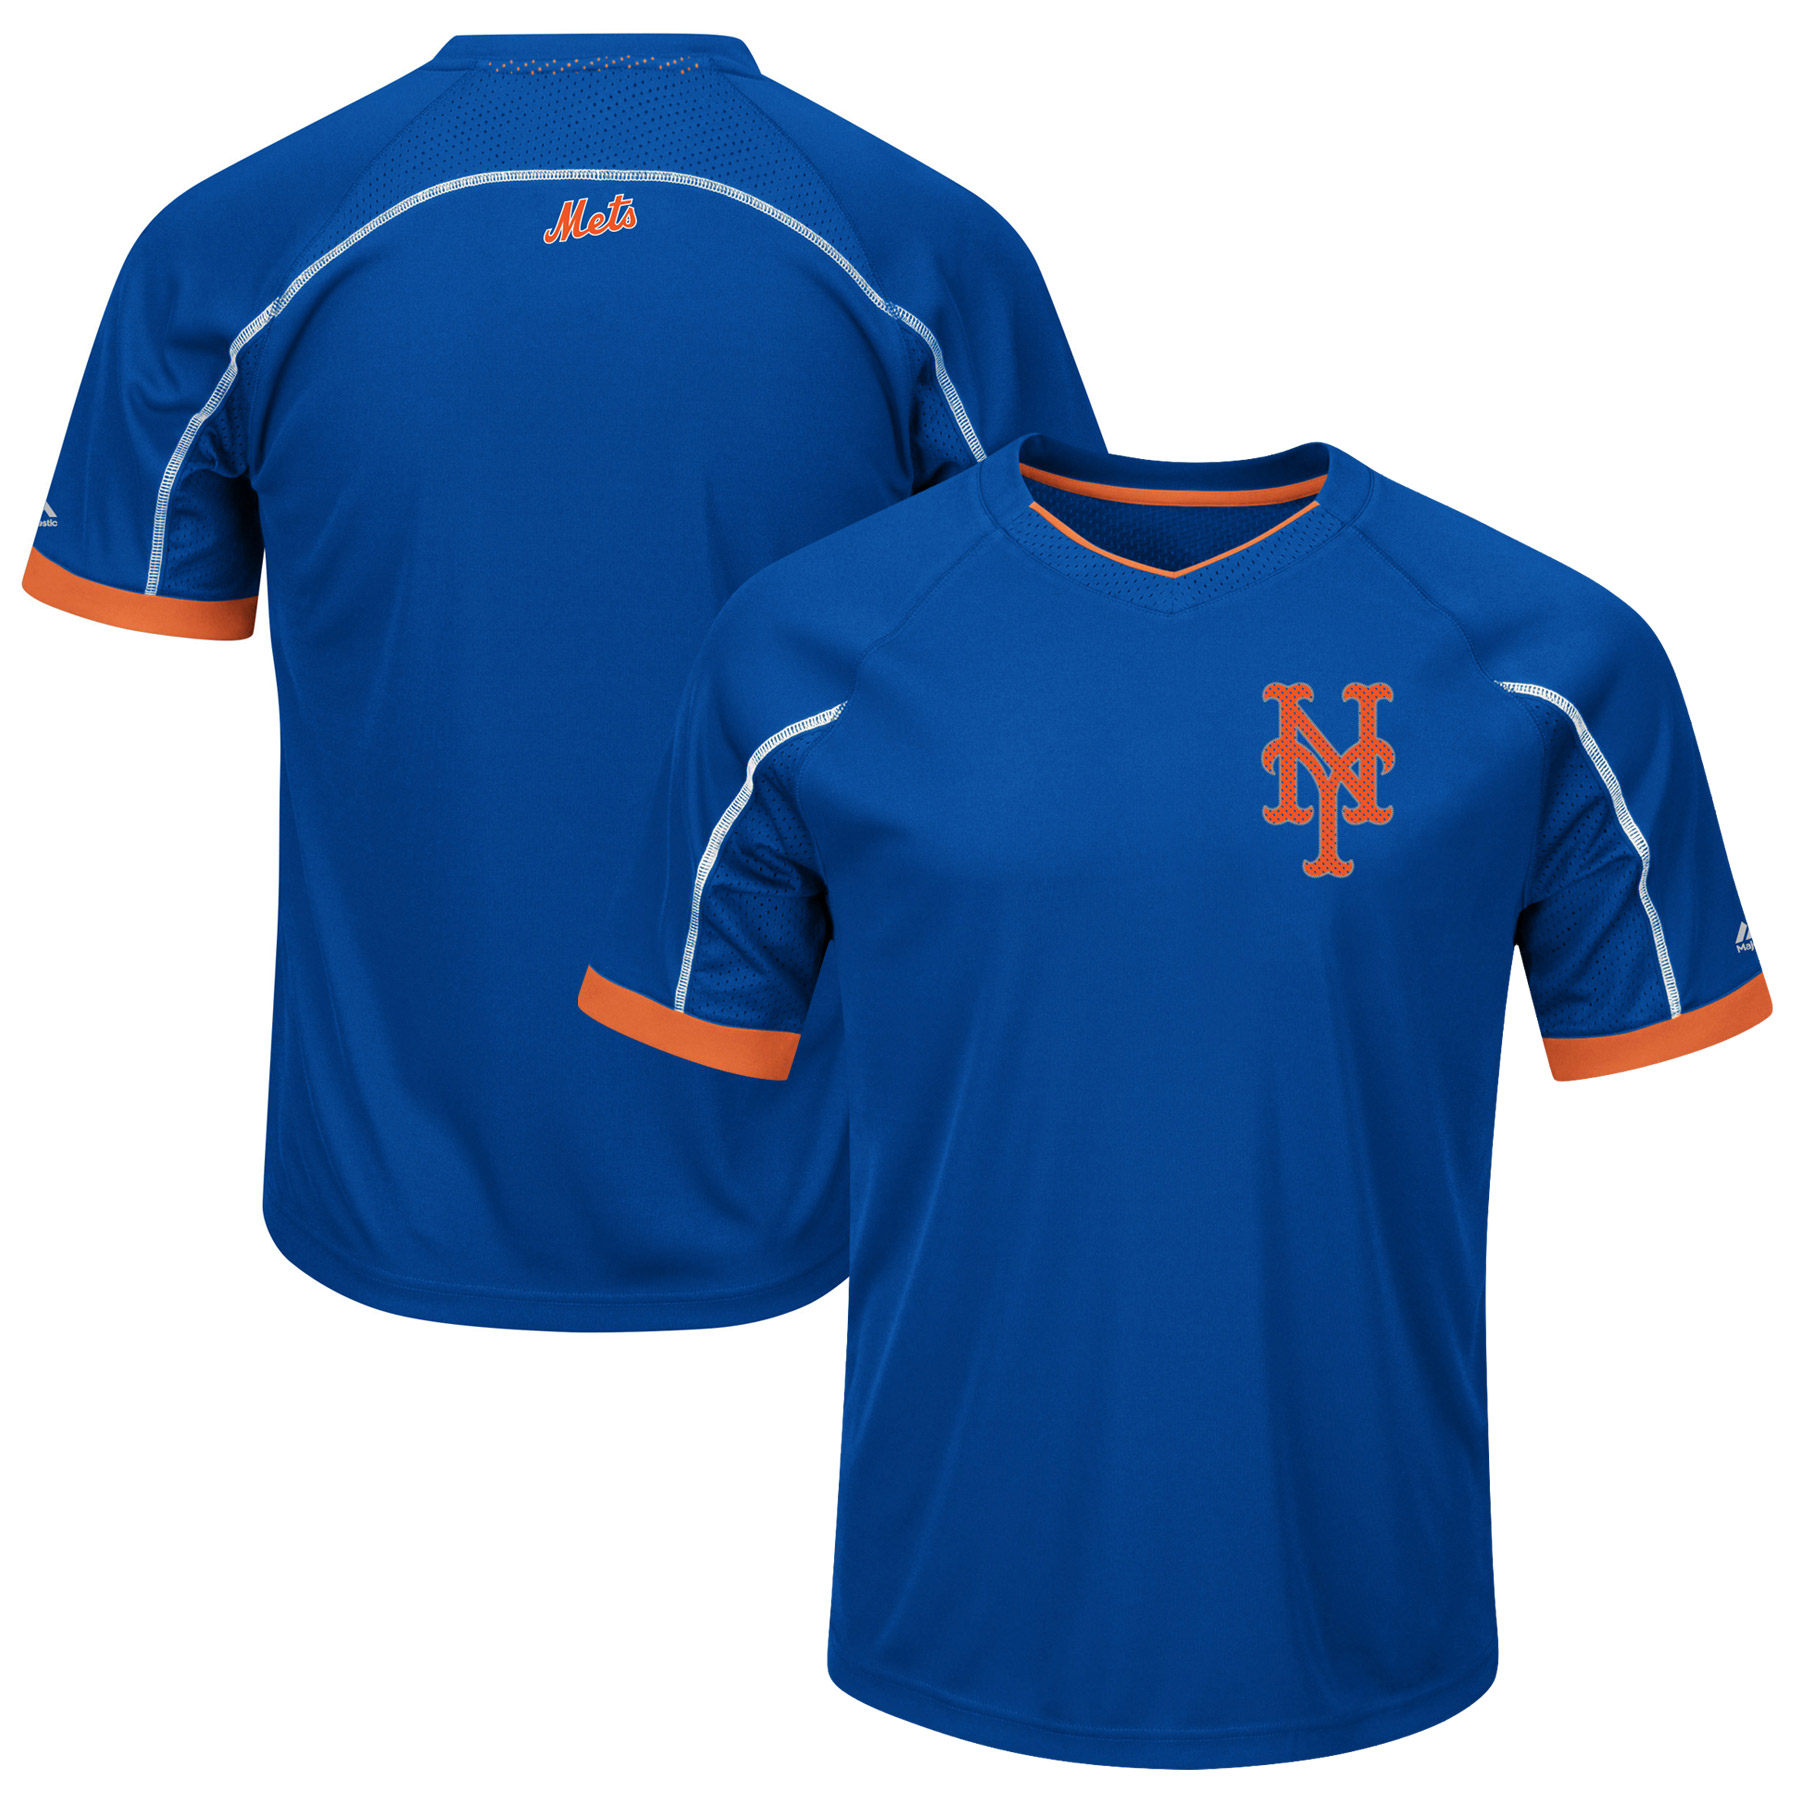 New York Mets Majestic Big & Tall Emergence V-Neck T-Shirt - Royal/Orange